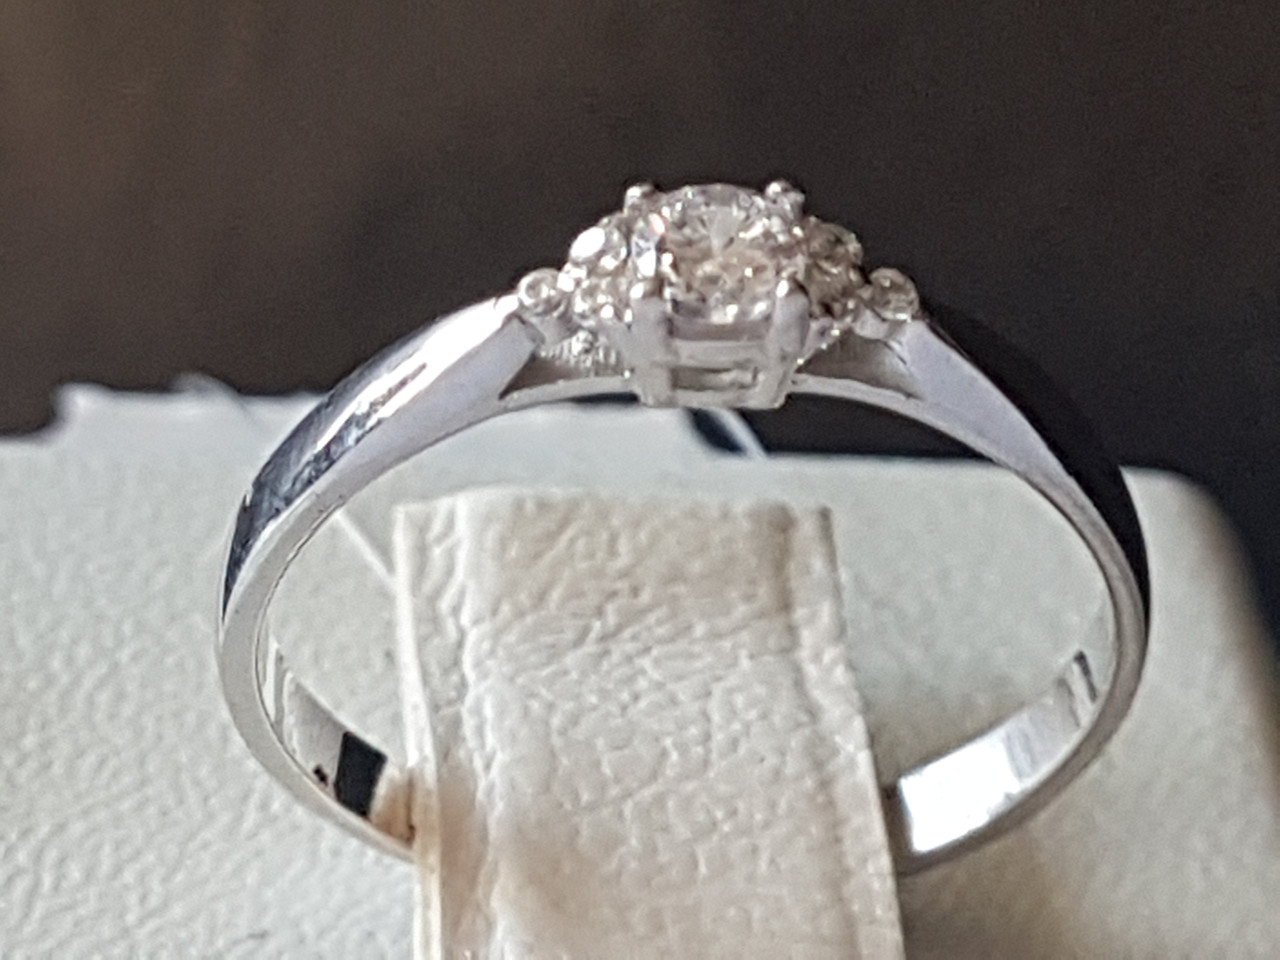 Серебряное кольцо с фианитами. Артикул 901-01005 16,5